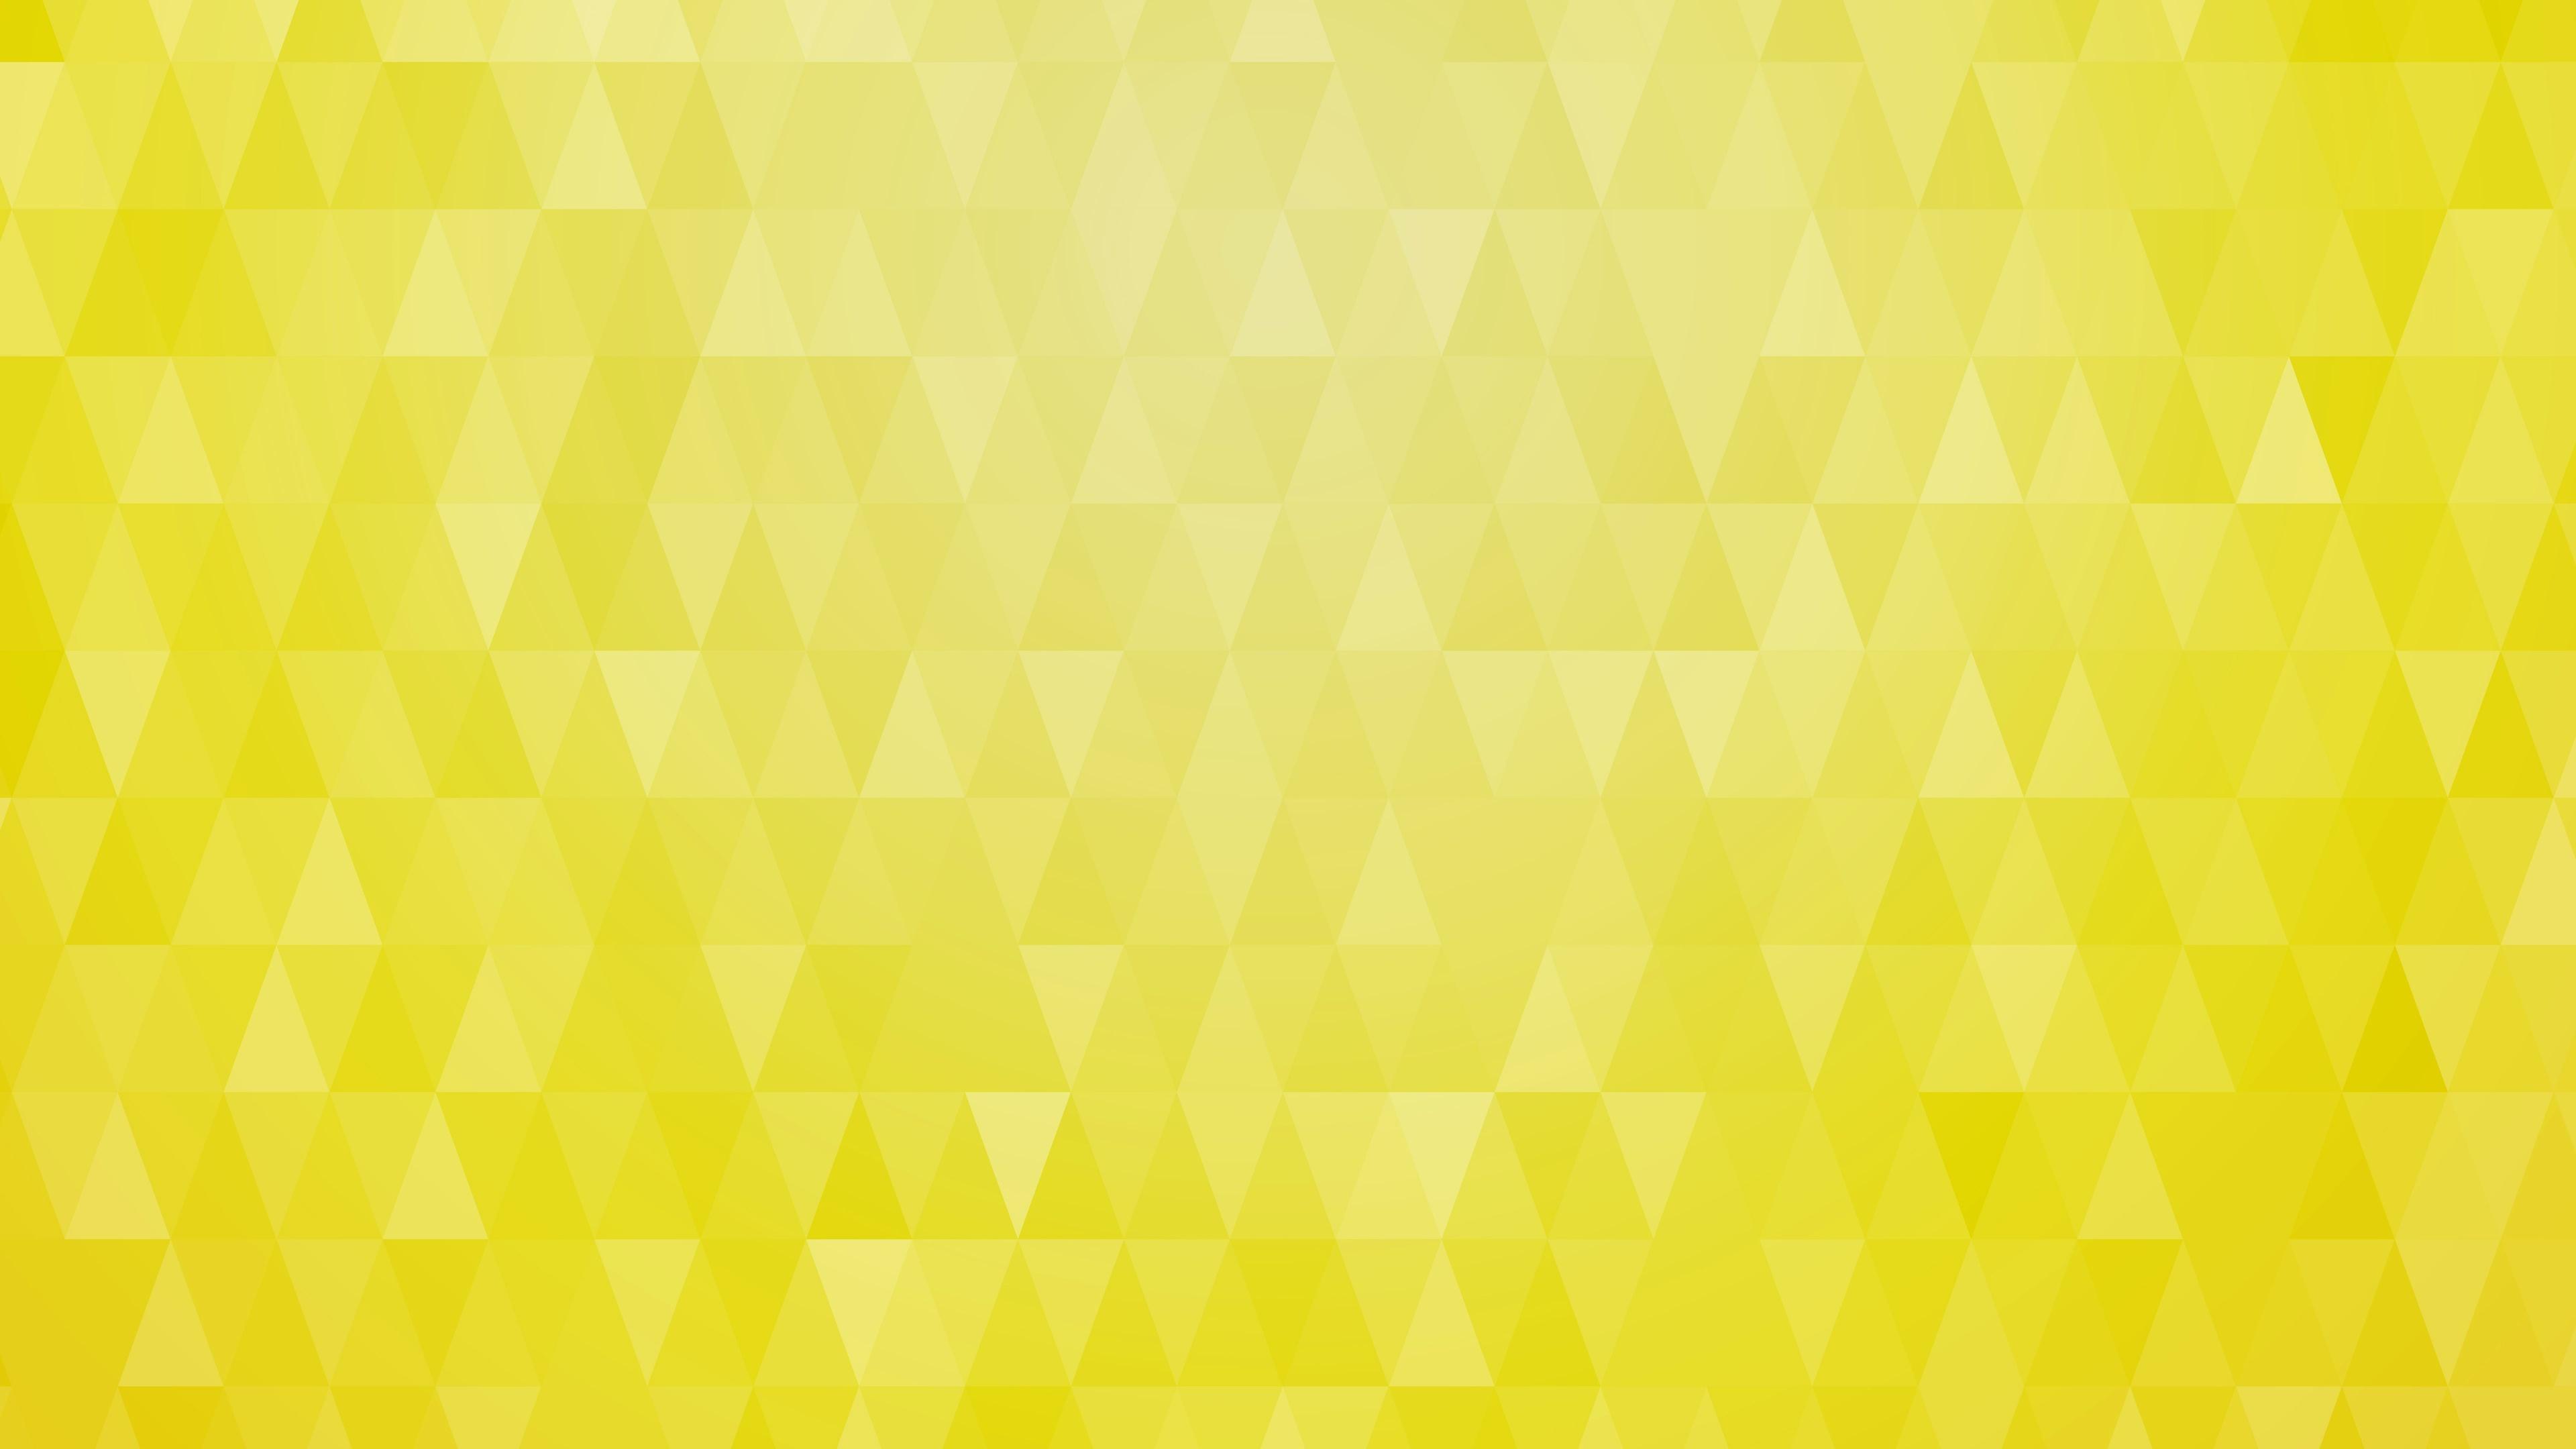 Wallpaper 4k Artistic Pattern Triangle Yellow 4k 4k Wallpapers Abstract Wallpapers Hd Wallpapers Pattern Wallpapers Triangle Wallpapers Yellow Wallpapers